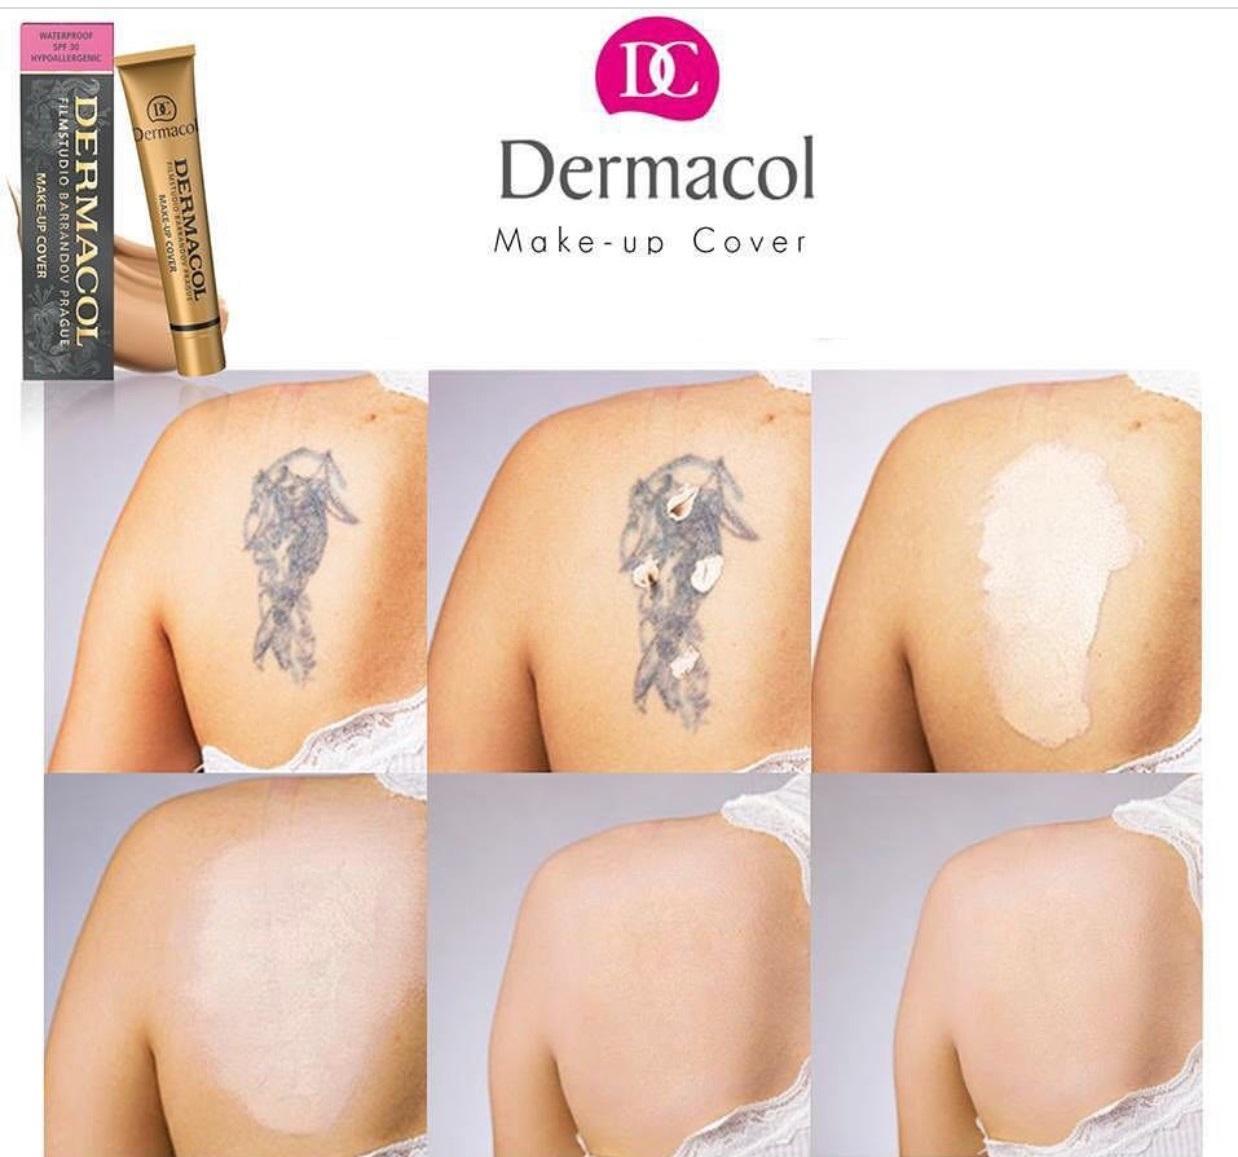 dermacol make up cover1